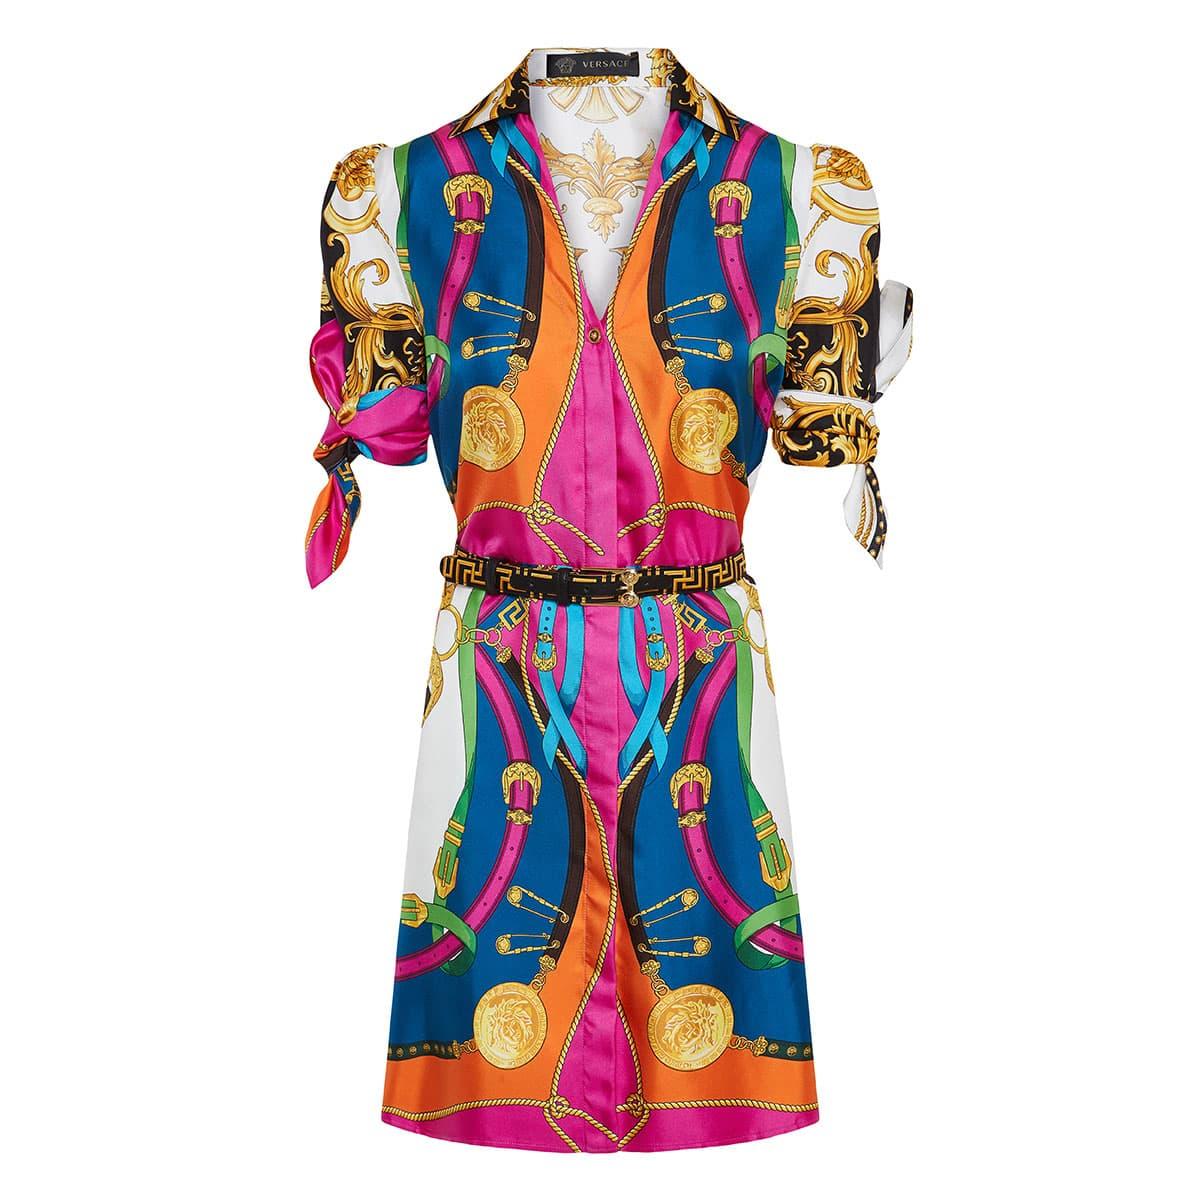 Barocco Rodeo printed shirt dress